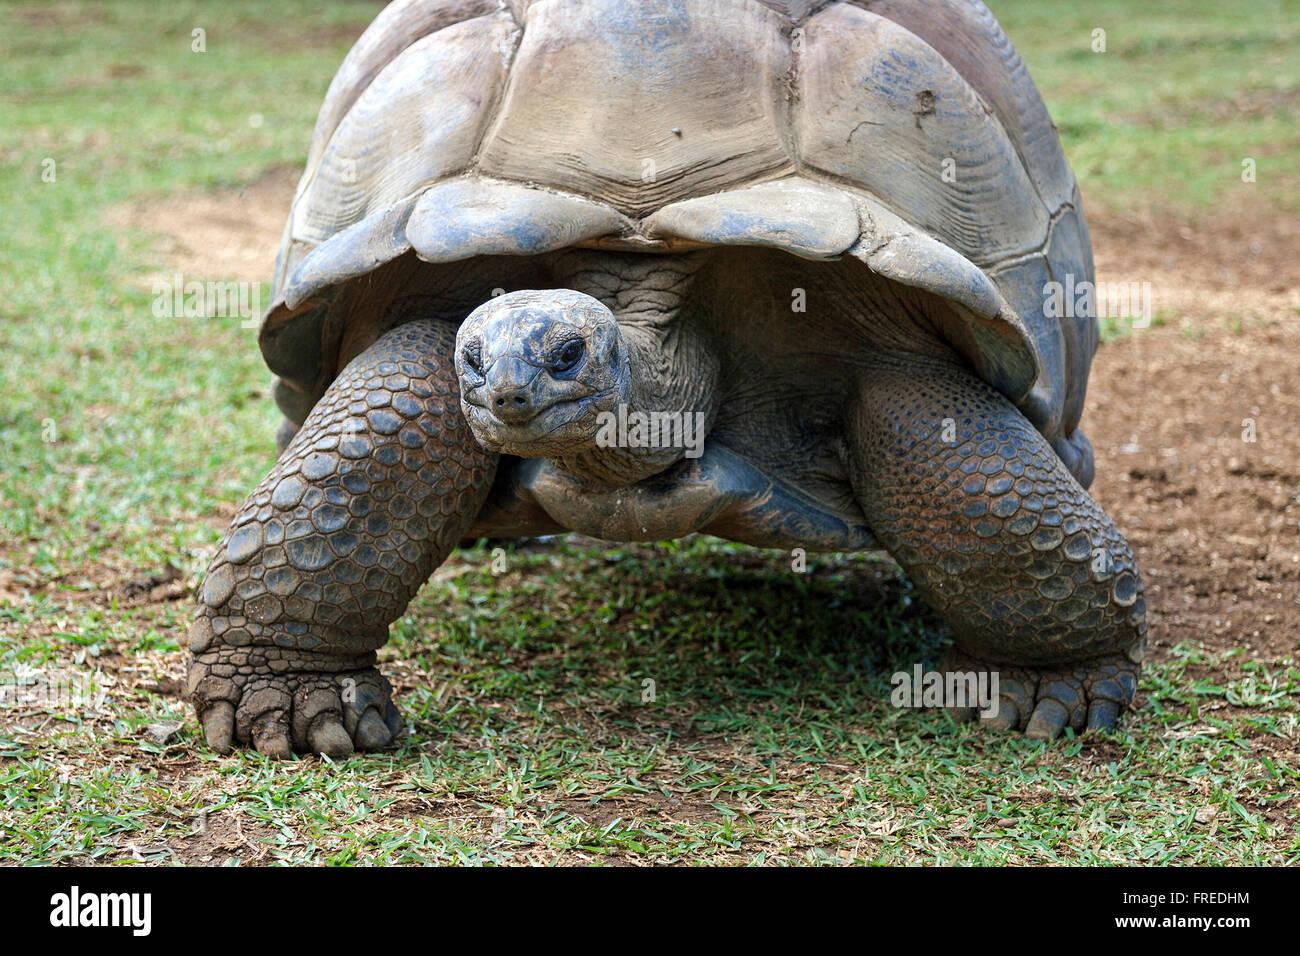 Aldabra giant tortoise (Aldabrachelys gigantea), captive, La Vanille Crocodile Park, Riviere des Anguilles, Mauritius - Stock Image